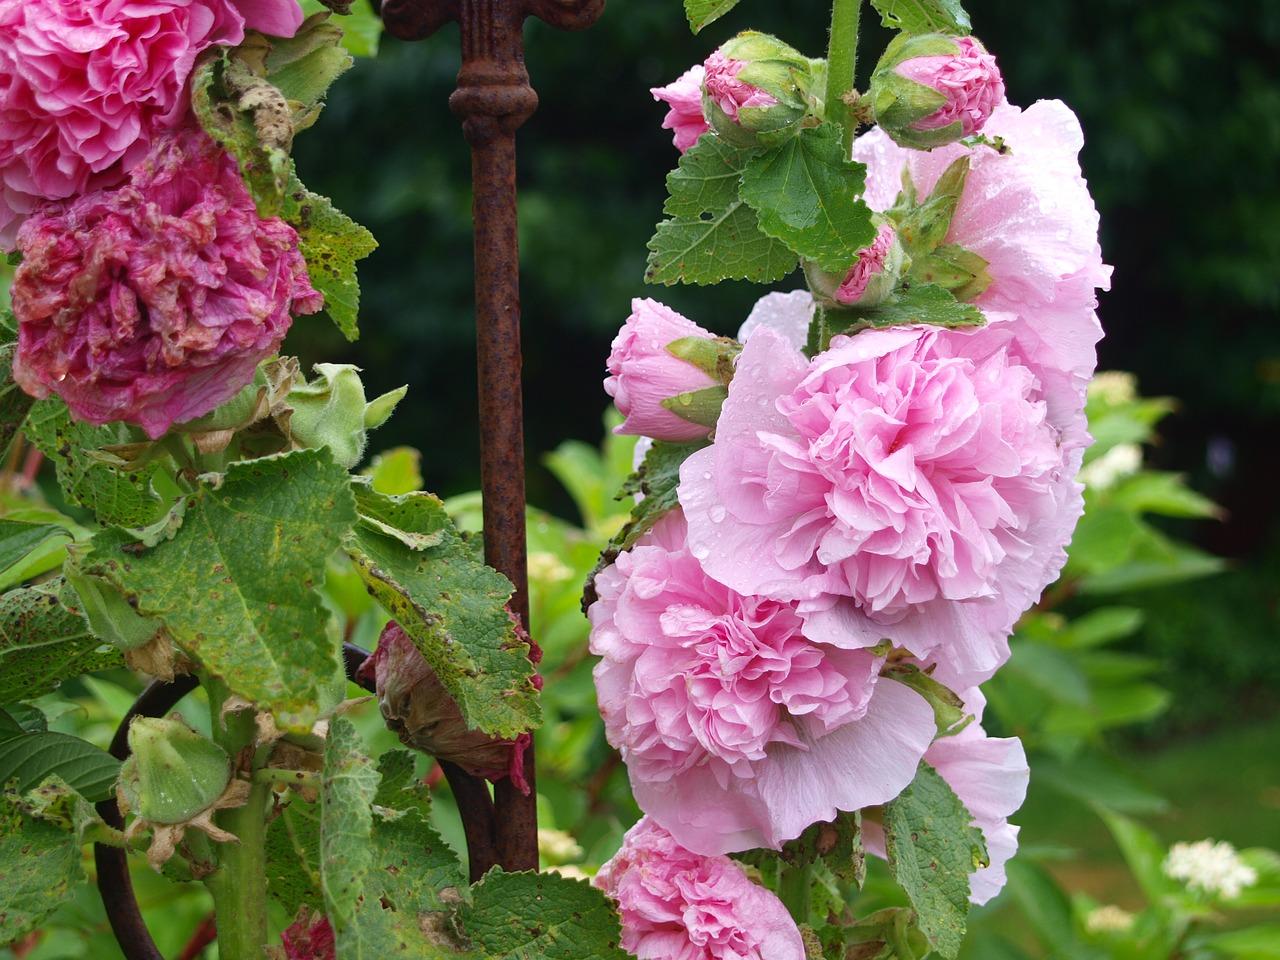 Stock Roserainpinkflowersgarden Free Photo From Needpix